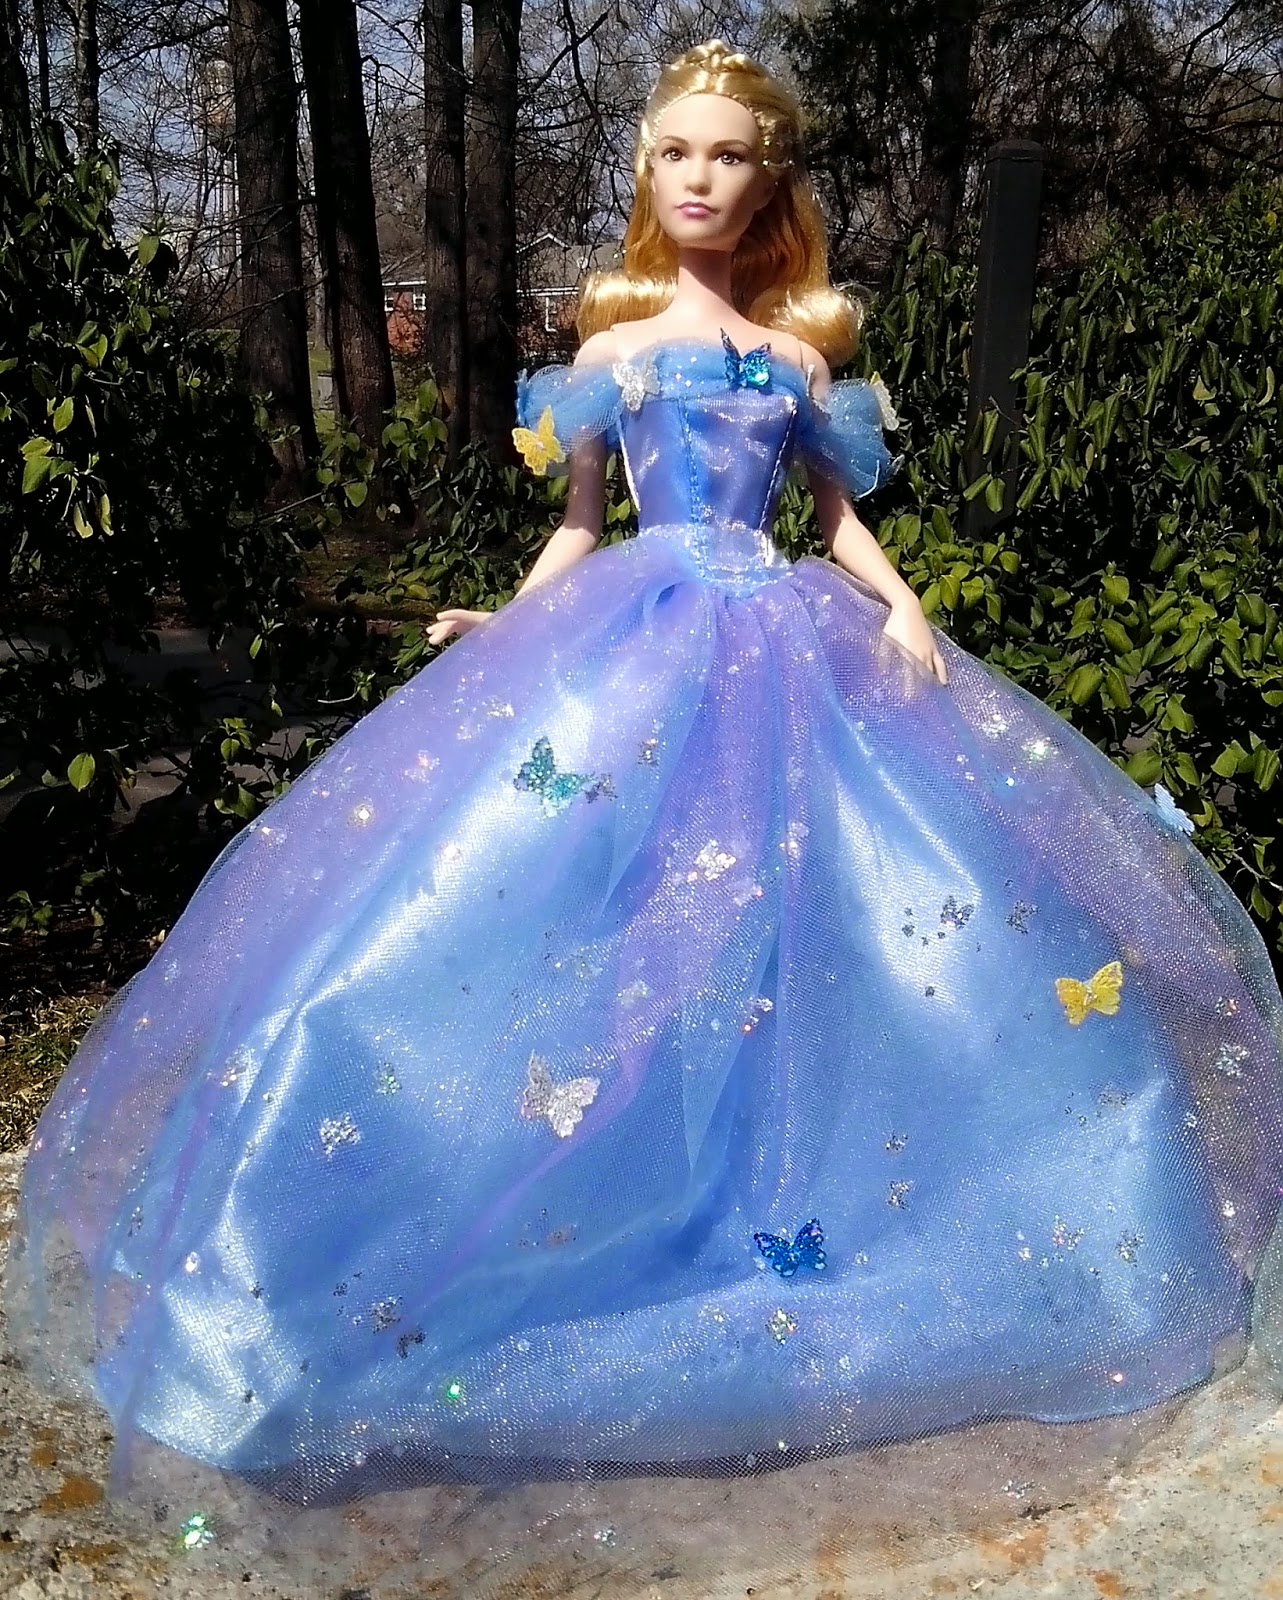 Disney Princess Royal Ball Cinderella Doll: Confessions Of A Dolly Lover: Mattel Royal Ball Cinderella